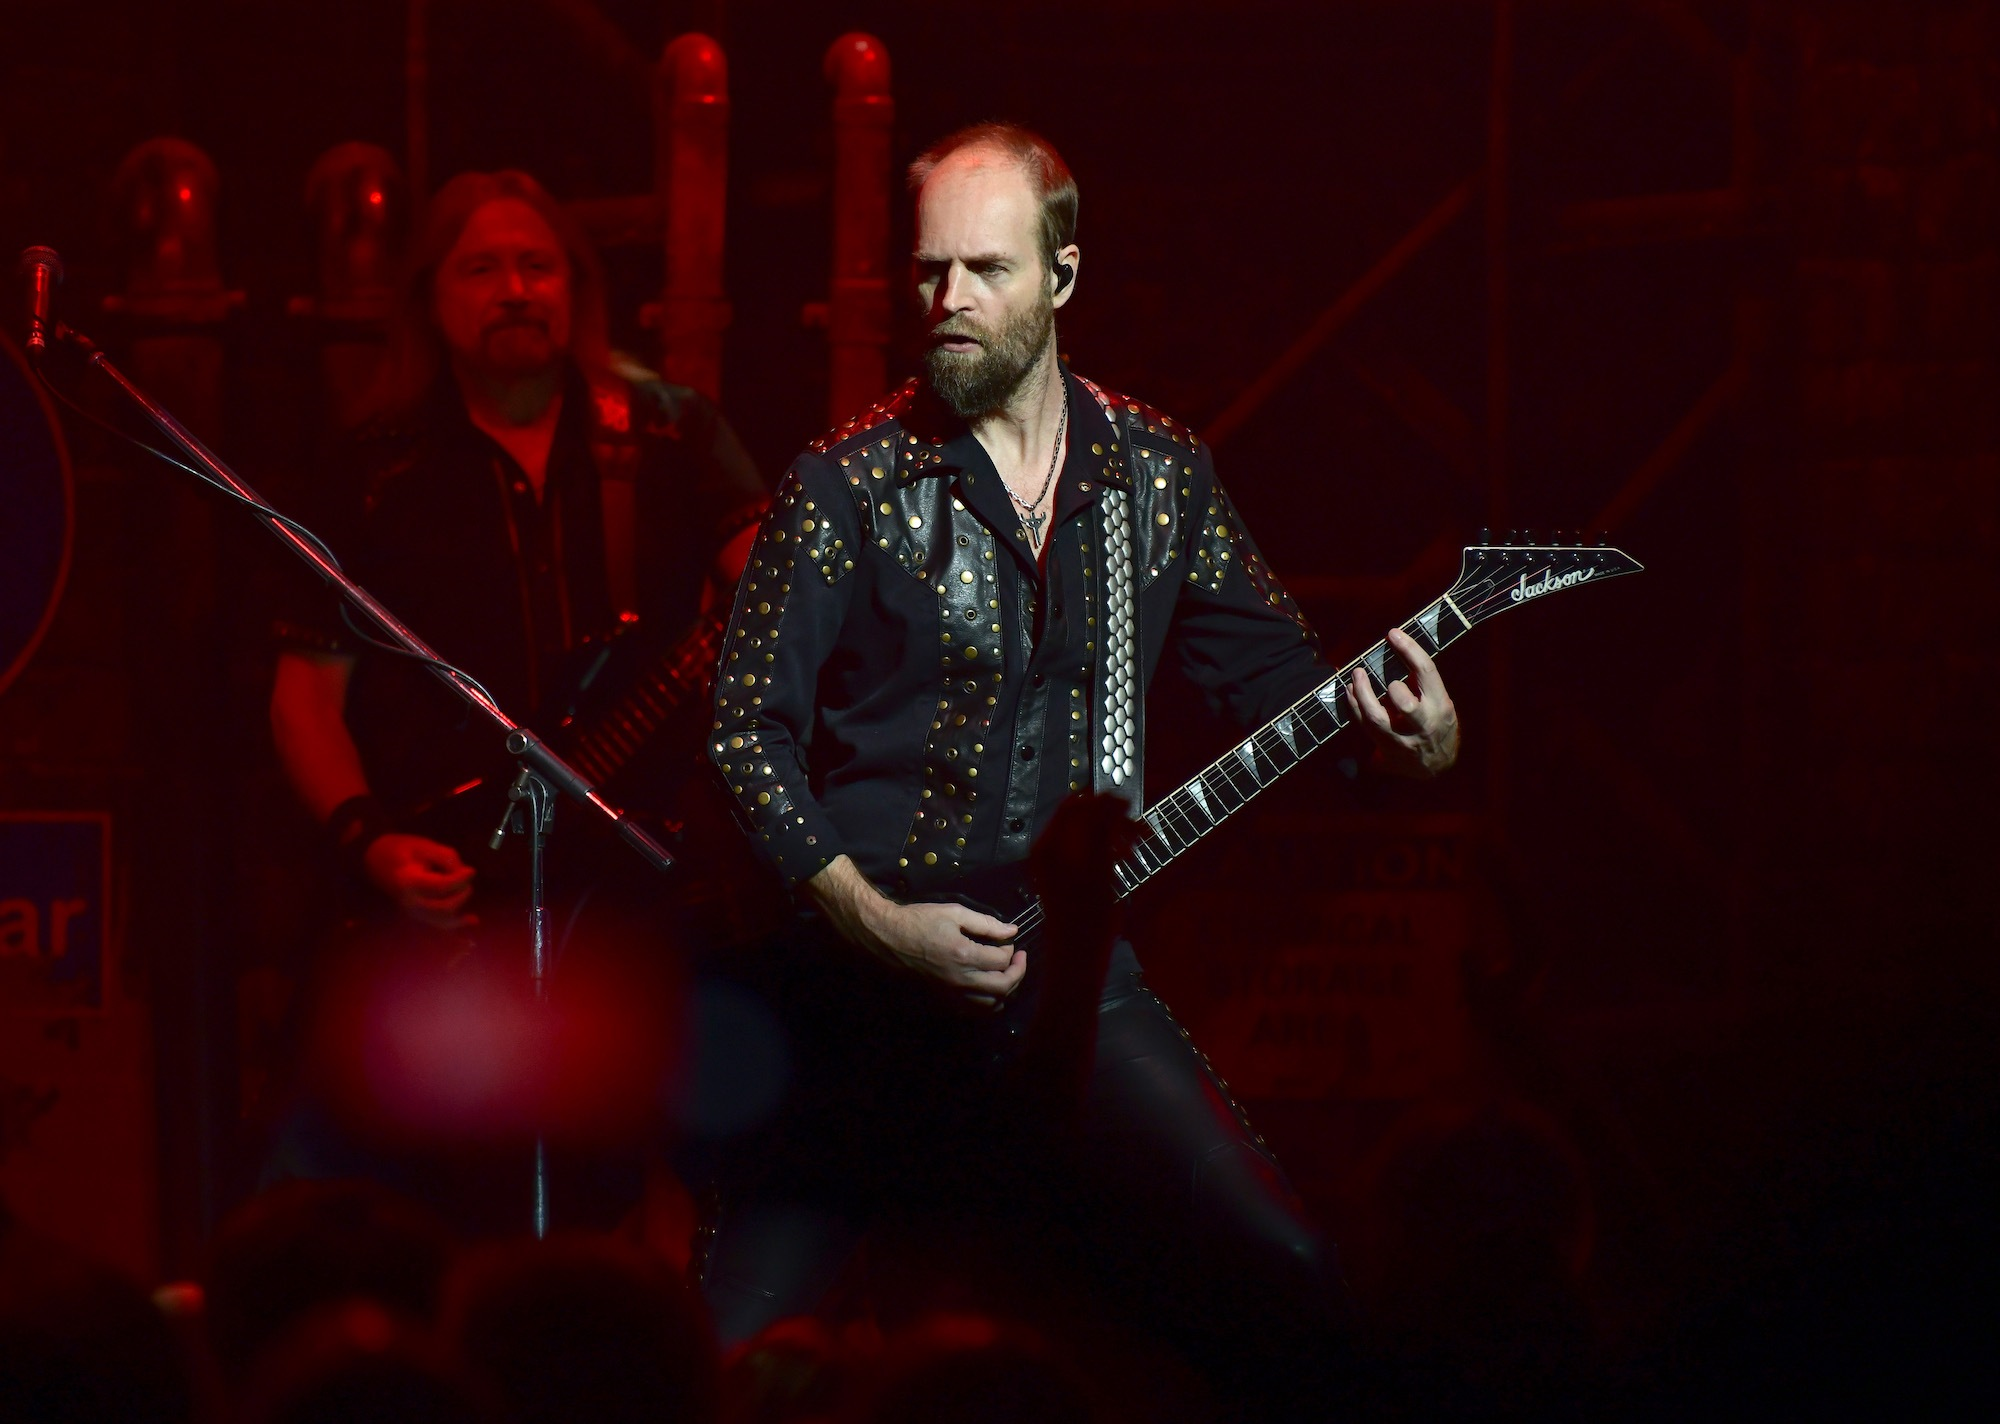 Judas Priest Live at Rosemont Theatre [GALLERY] 1